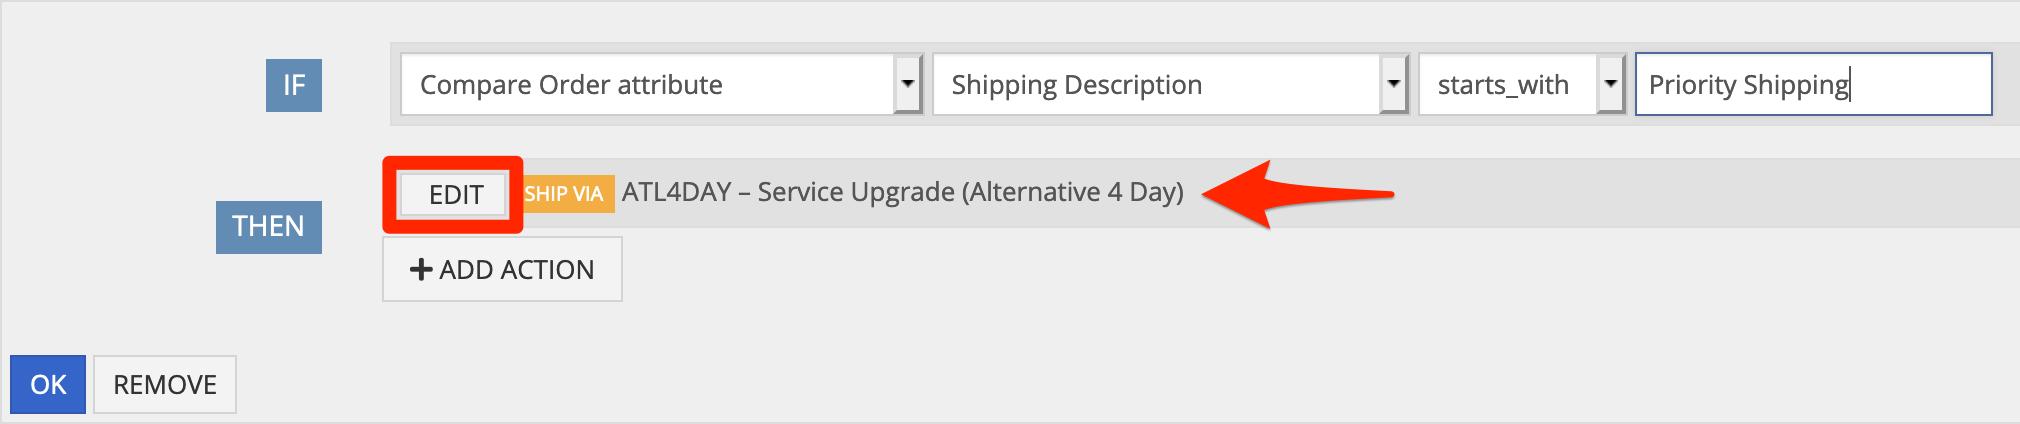 Set the Ship Via method, and click OK.